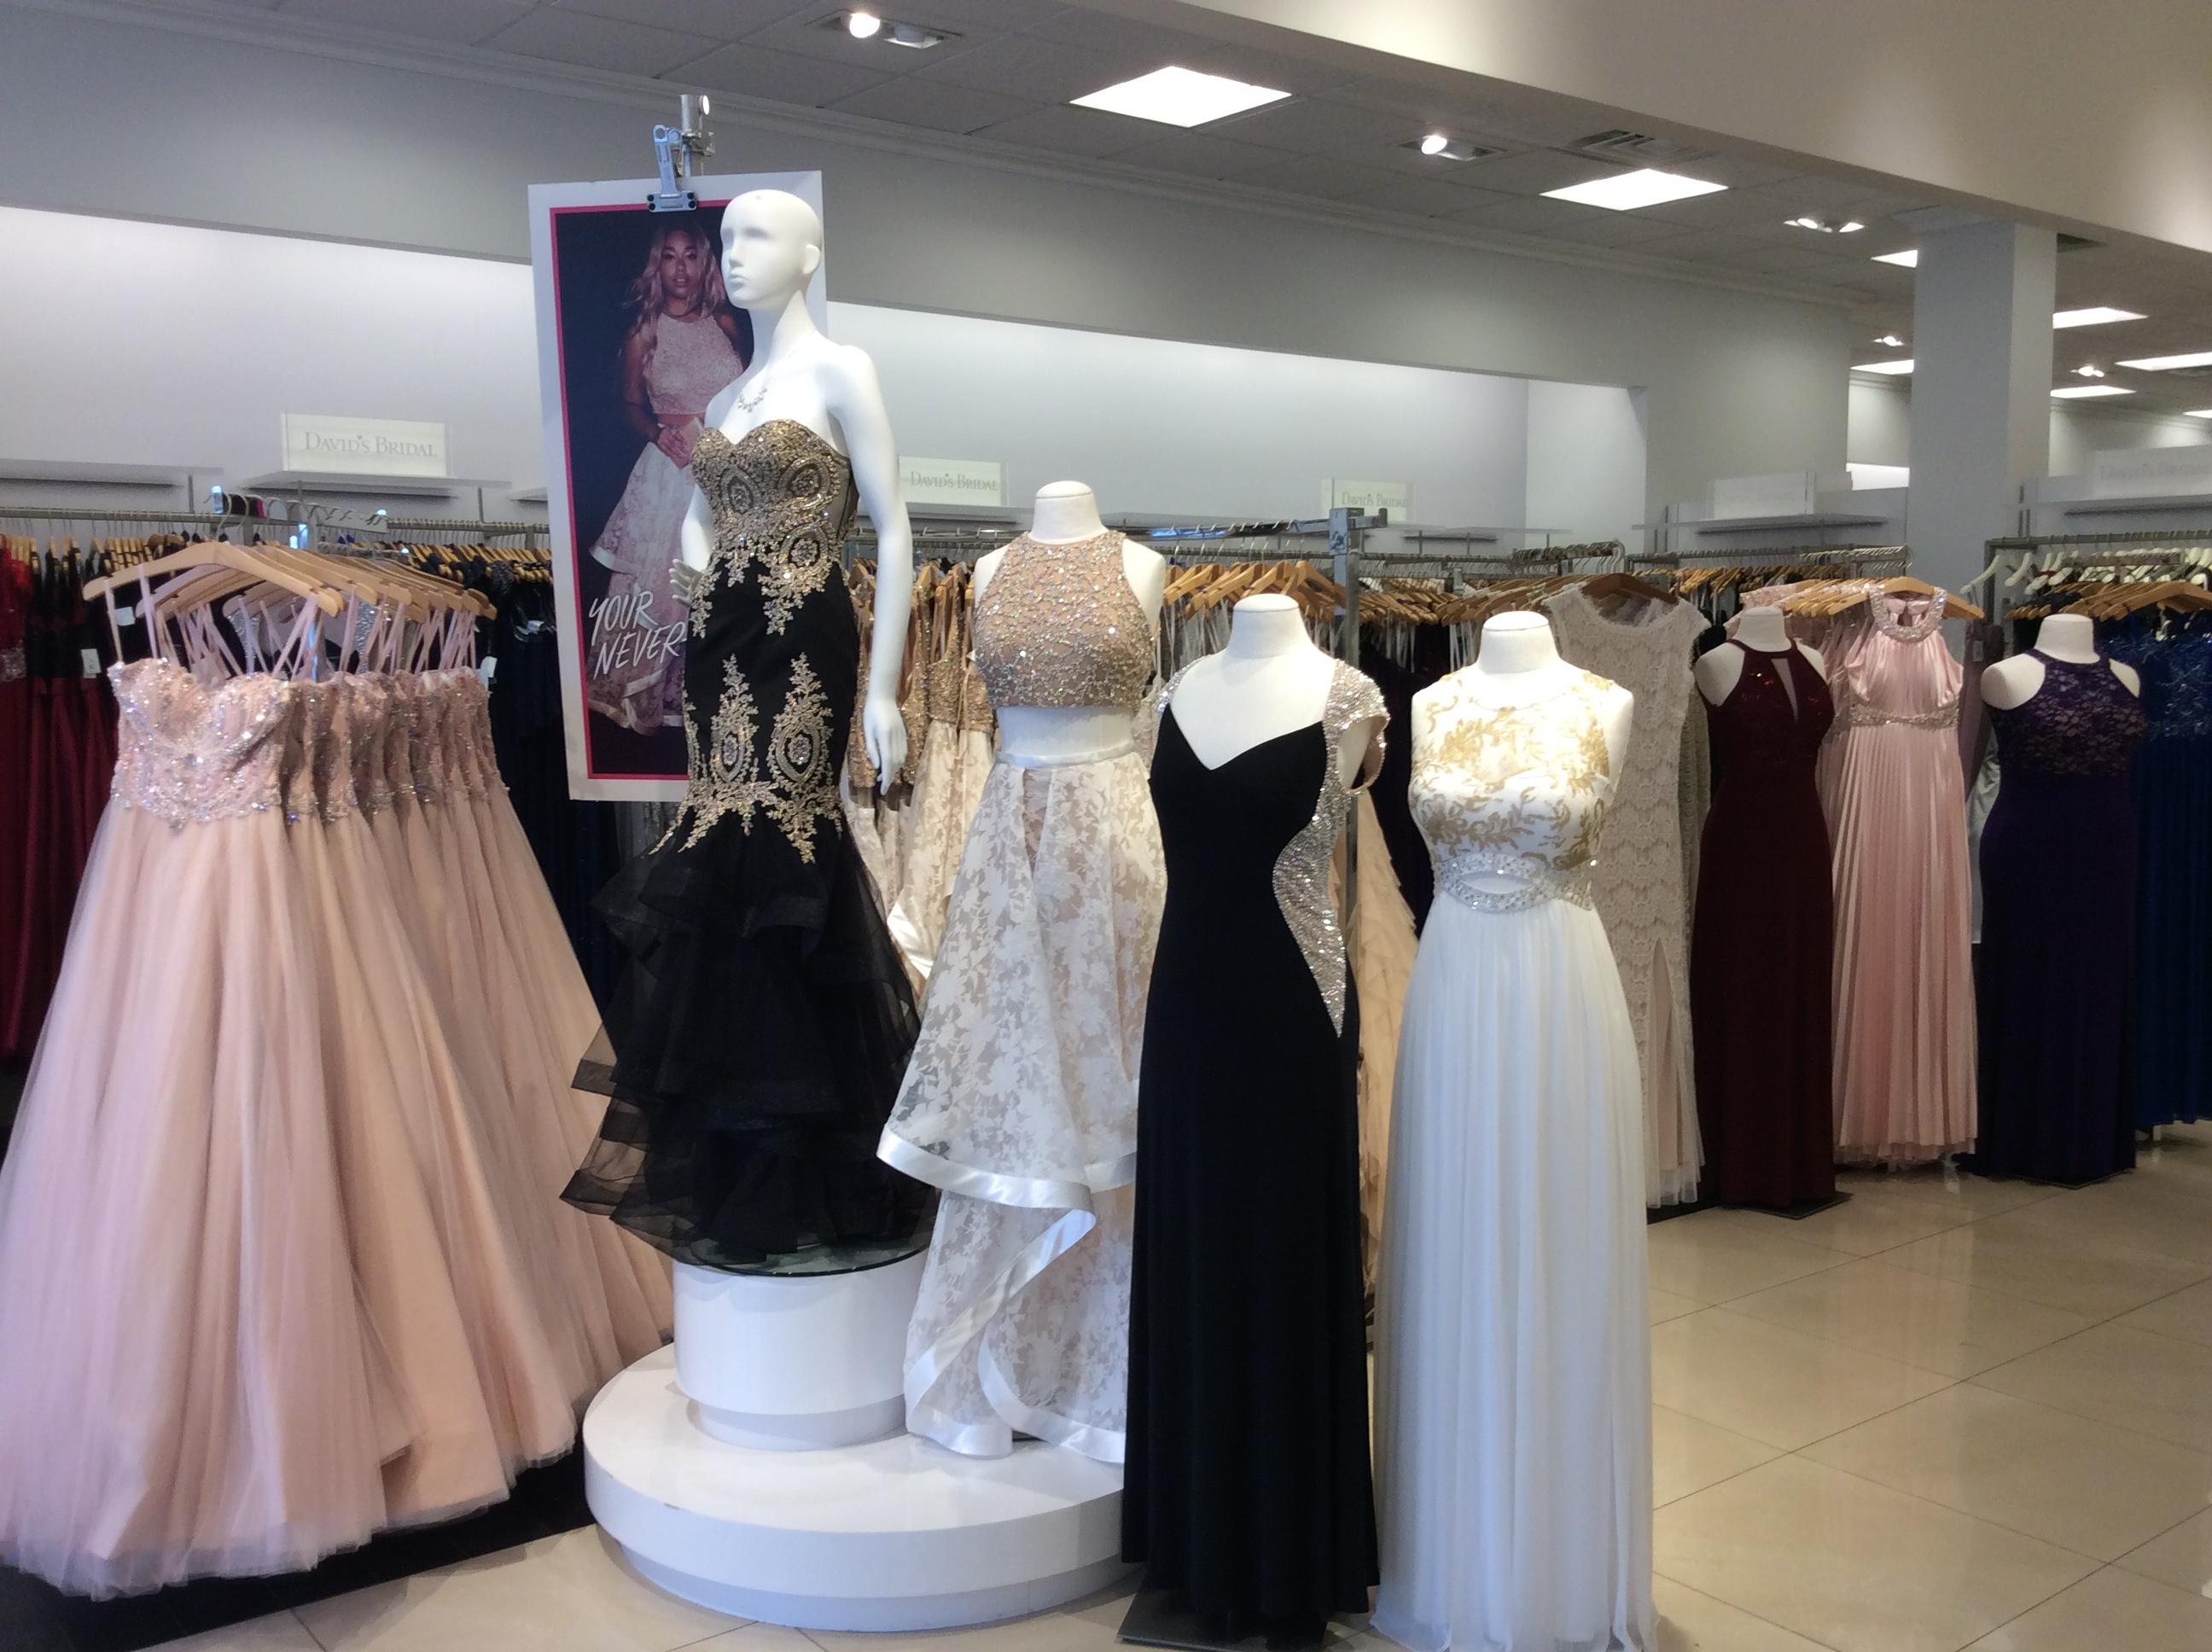 Best Garment district wedding dresses in Los Angeles, CA - Yelp 58